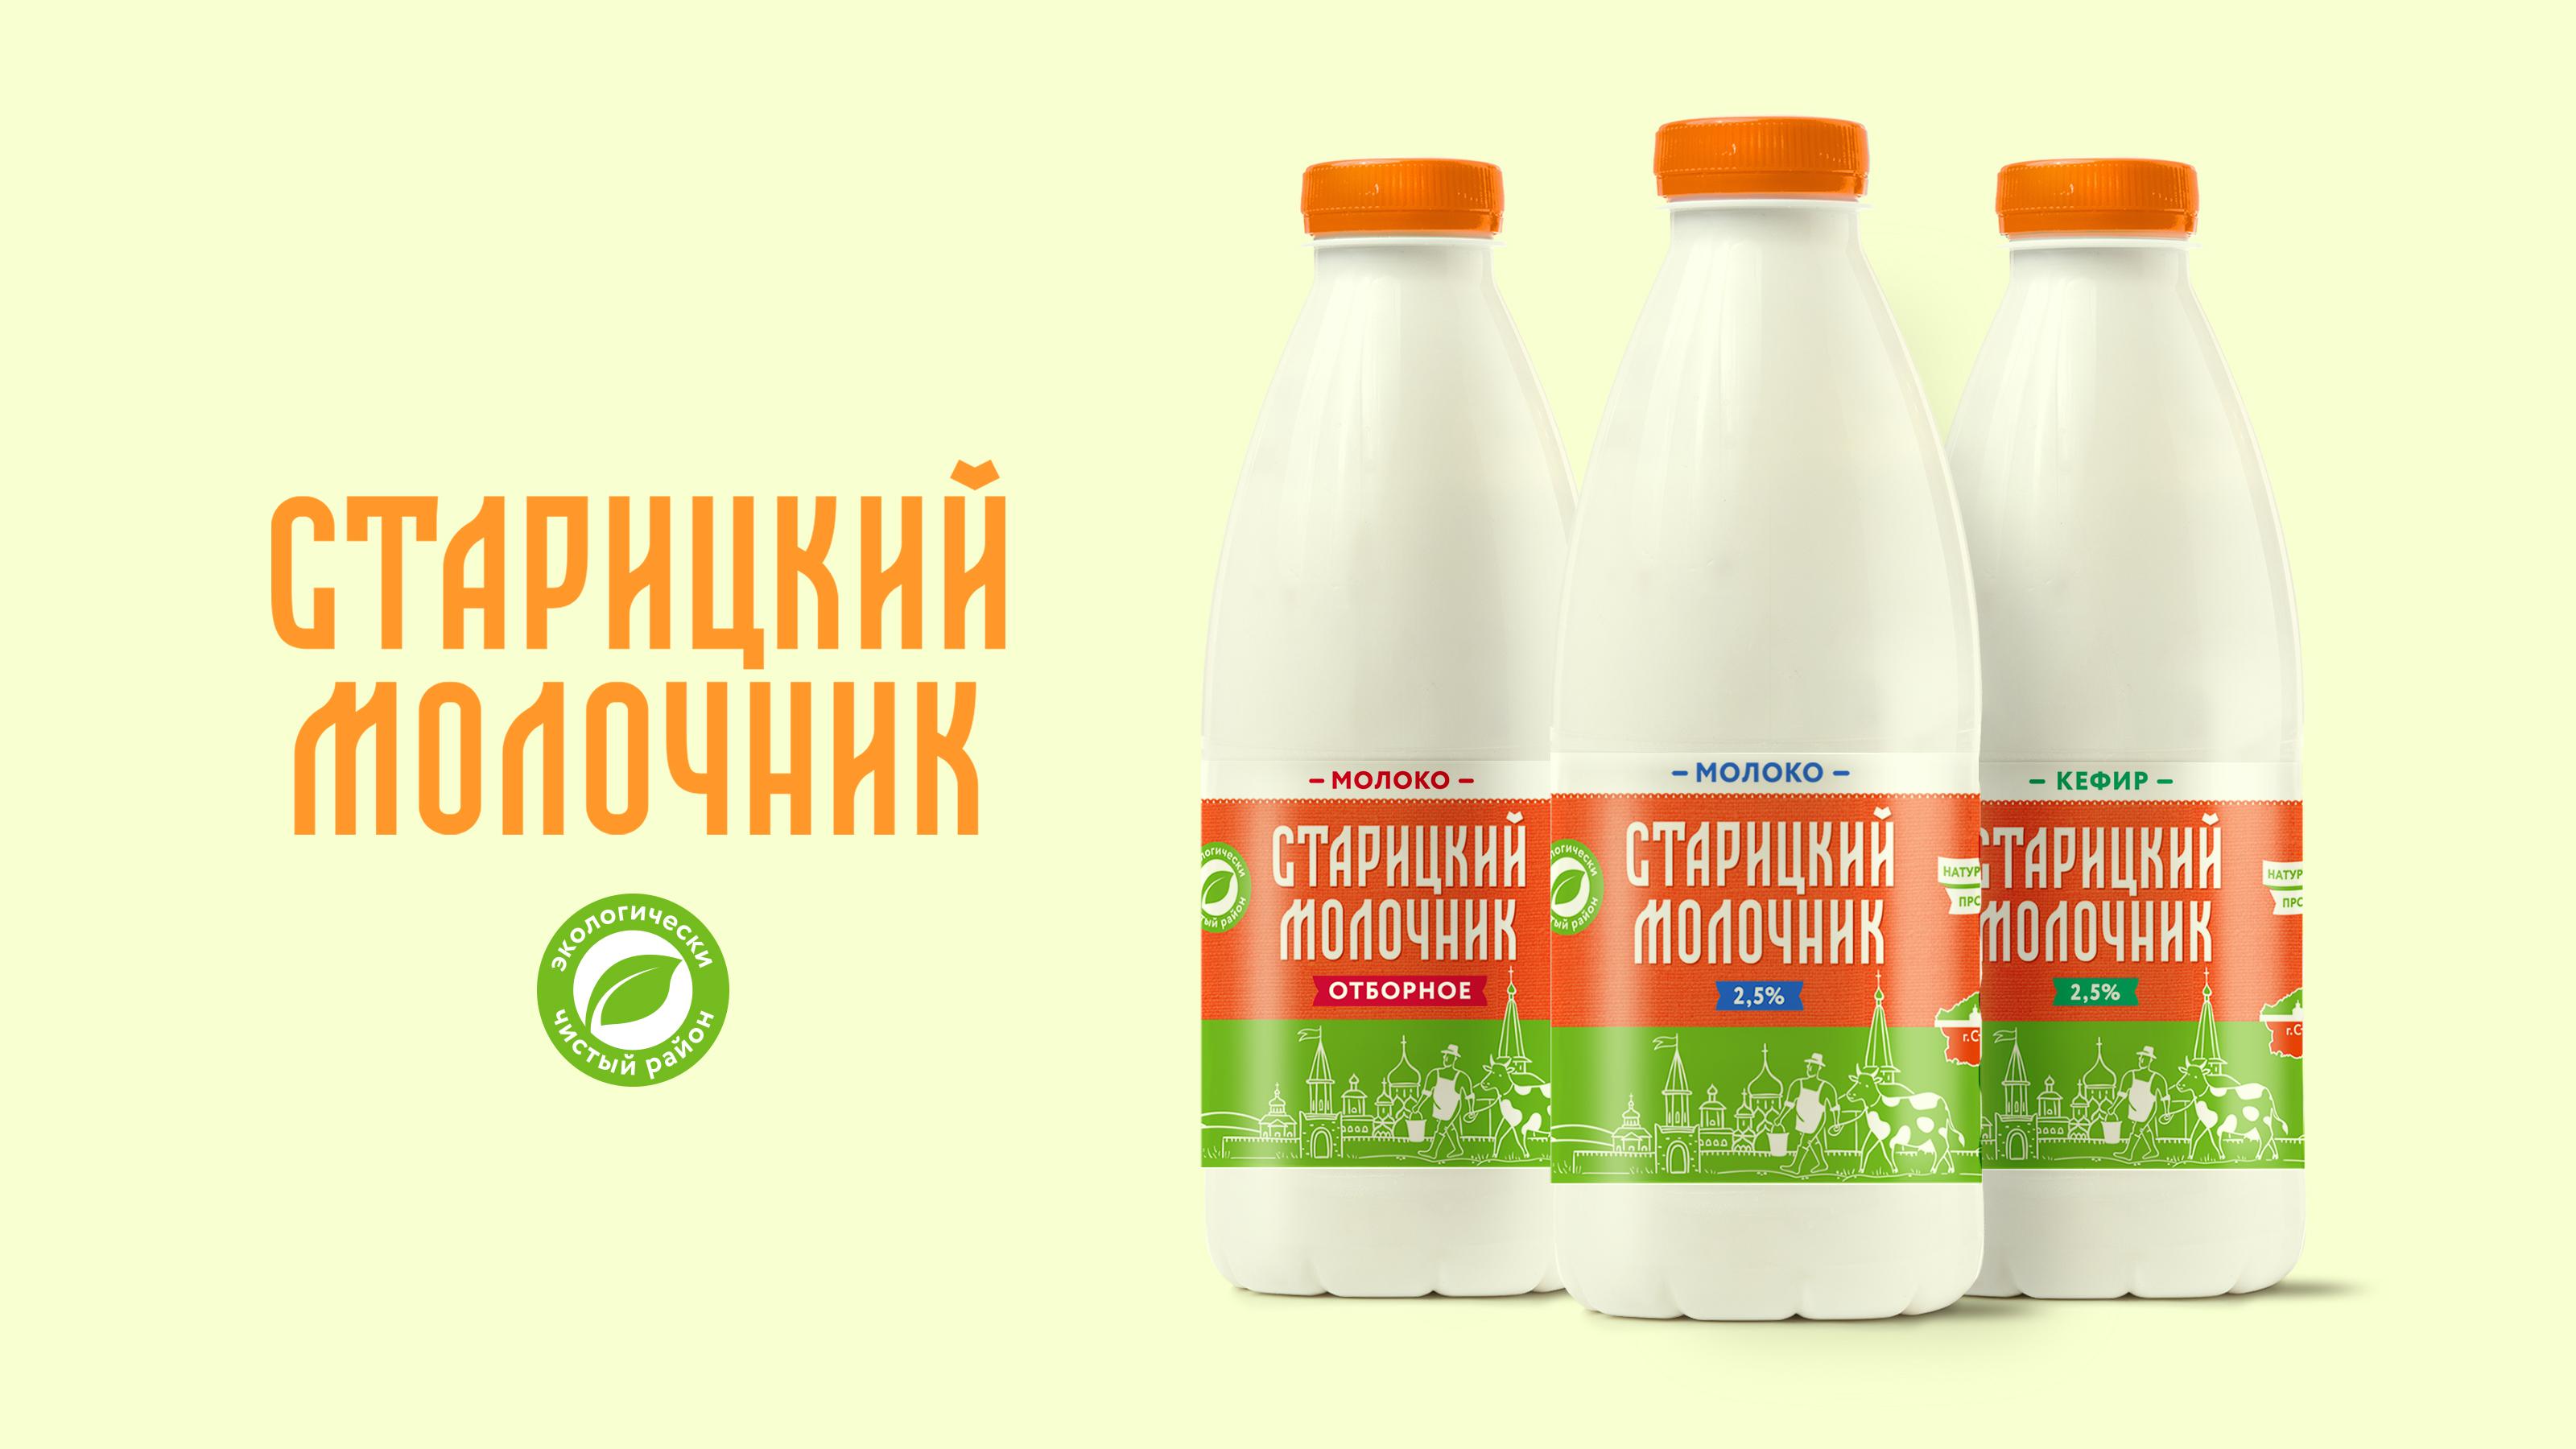 Старицкий Молочник - Kima